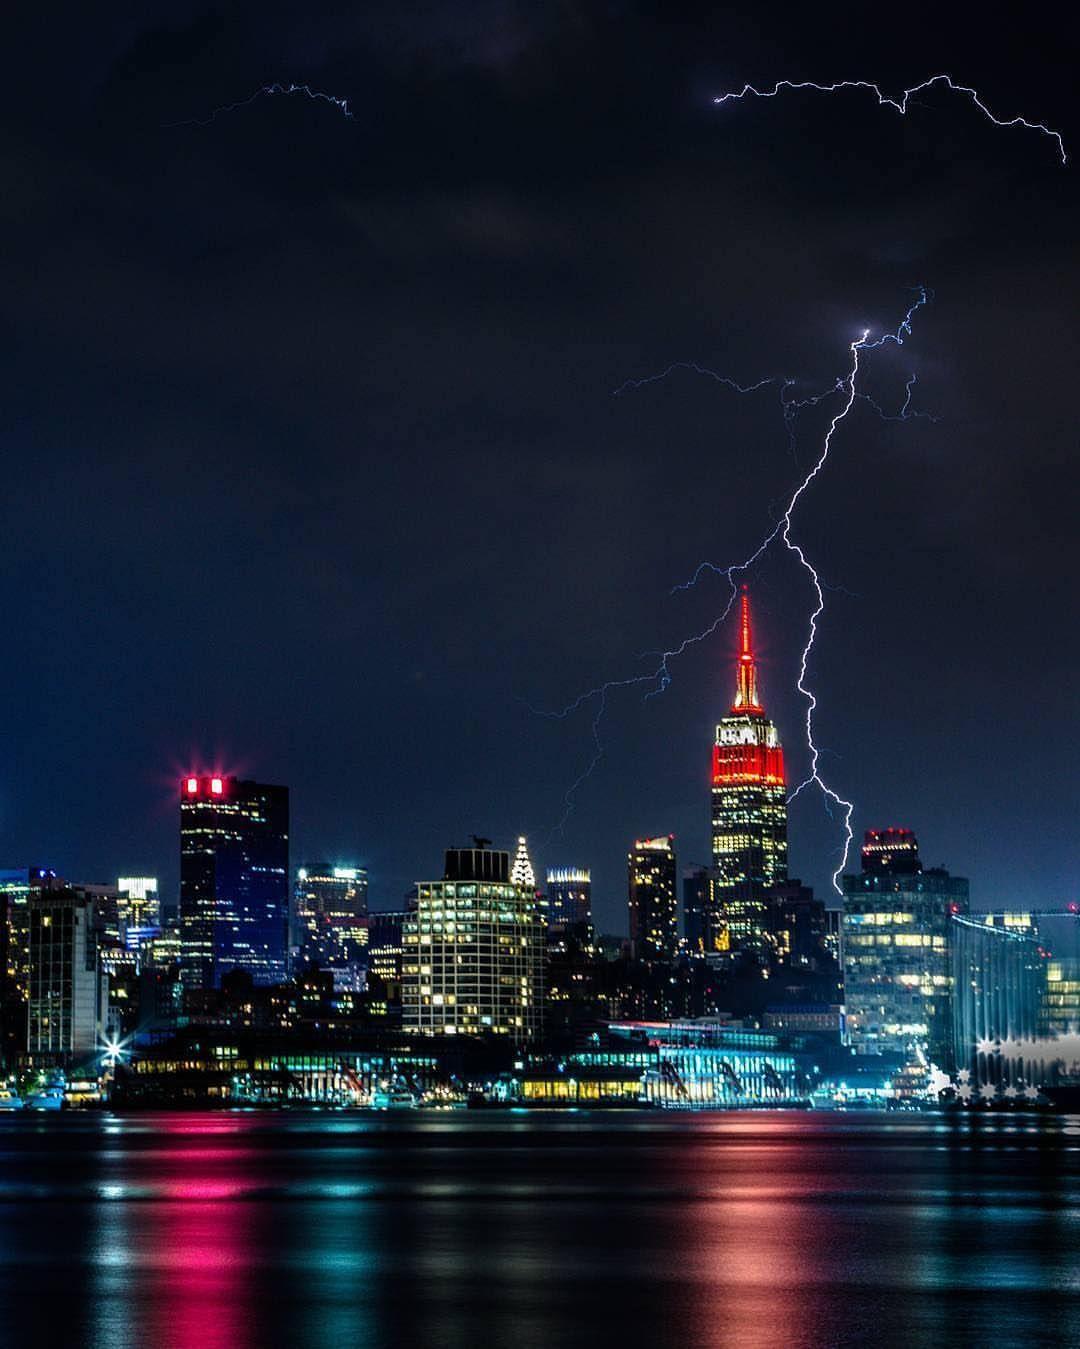 Shooting lightning is addicting  by @durty_jerzey #newyorkcityfeelings #nyc #newyork